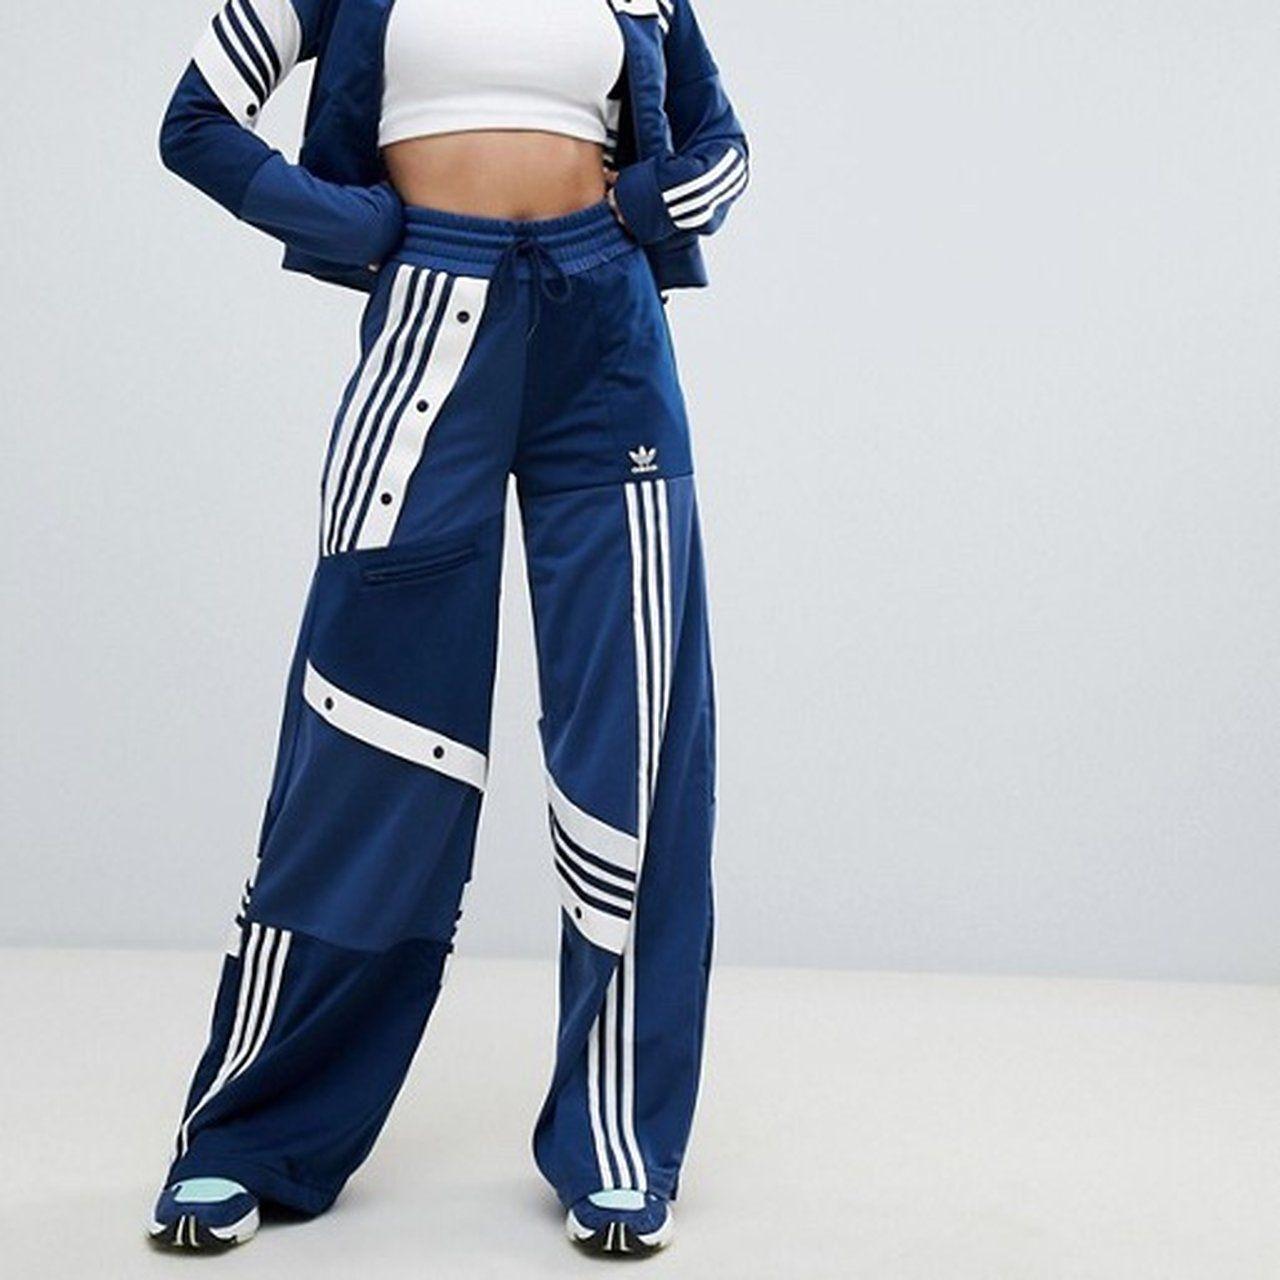 Topshop X Adidas originals collaboration track Depop